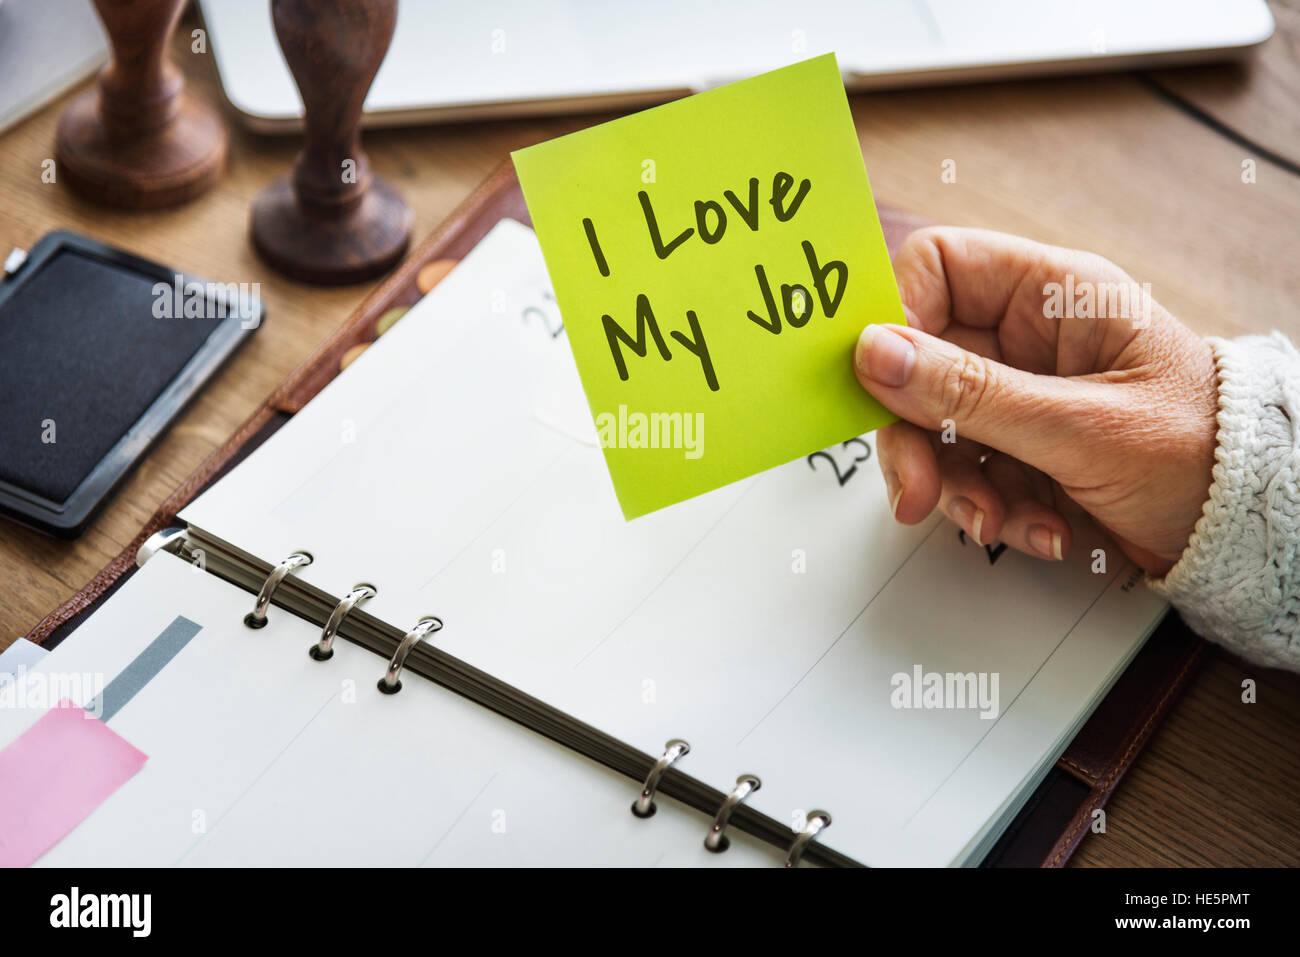 I Love My Job Positive Achievement Concept - Stock Image